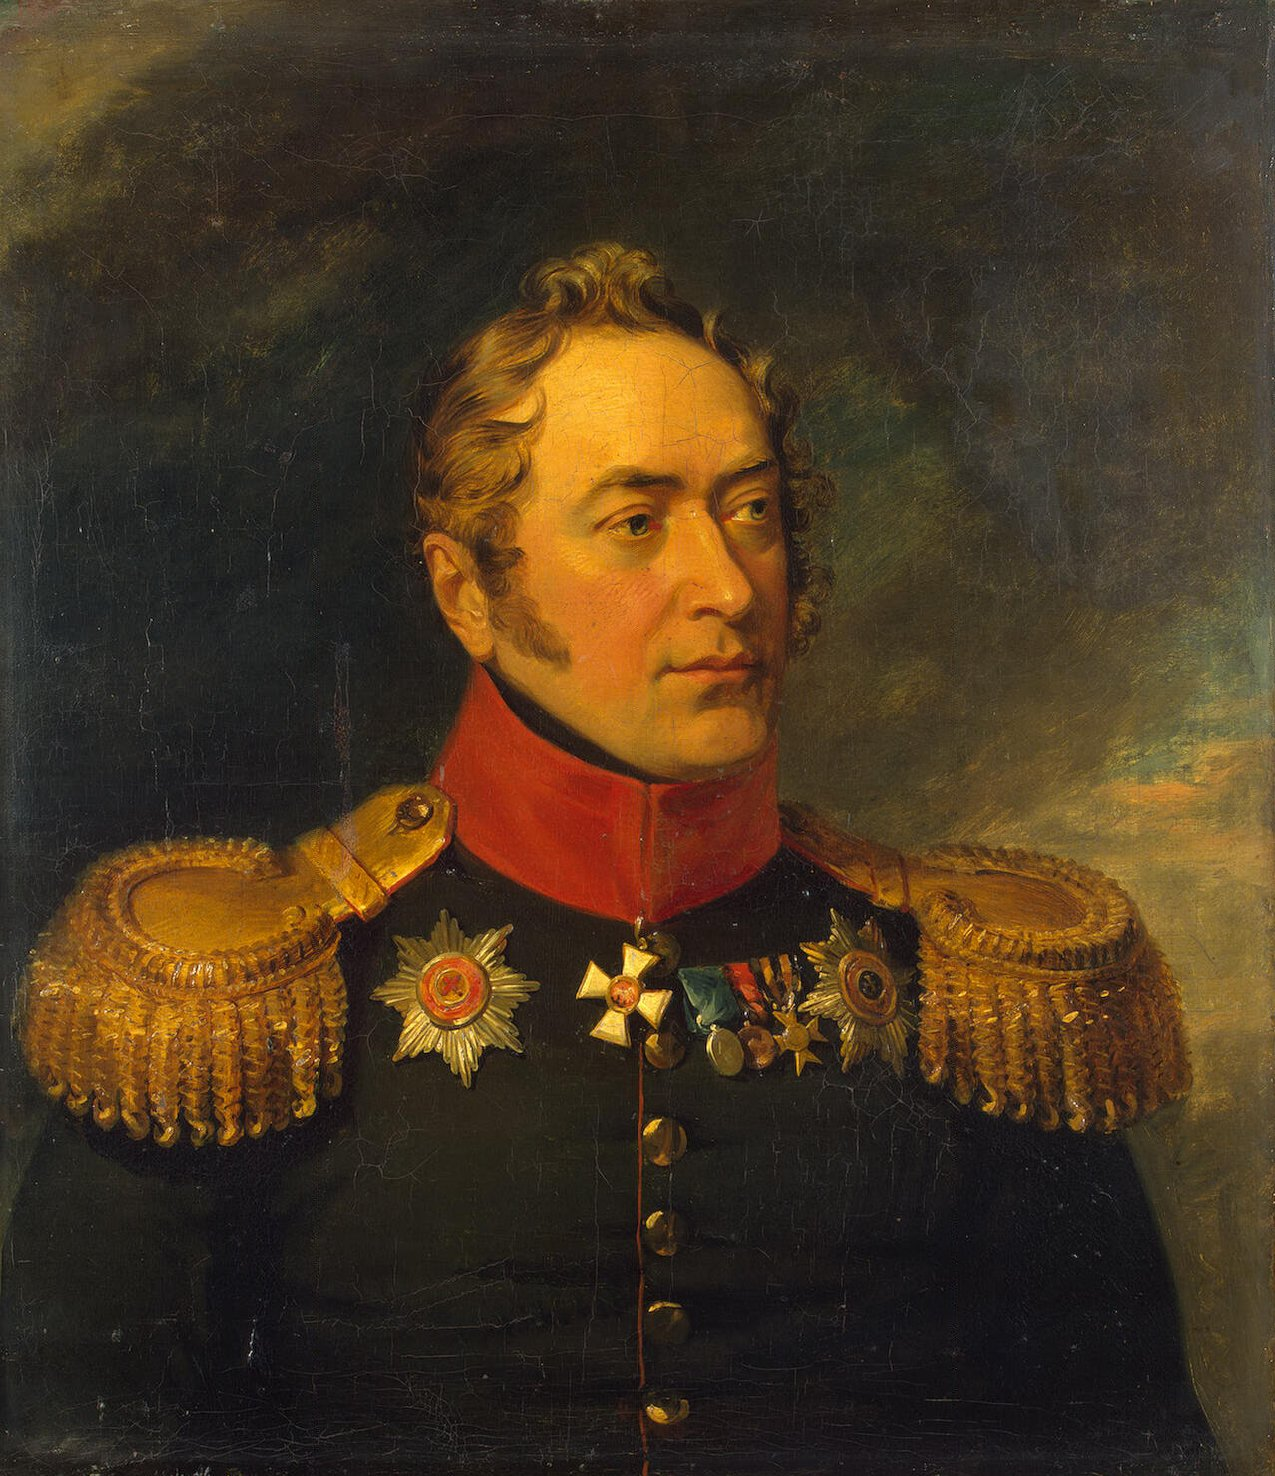 Хованский, Николай Николаевич